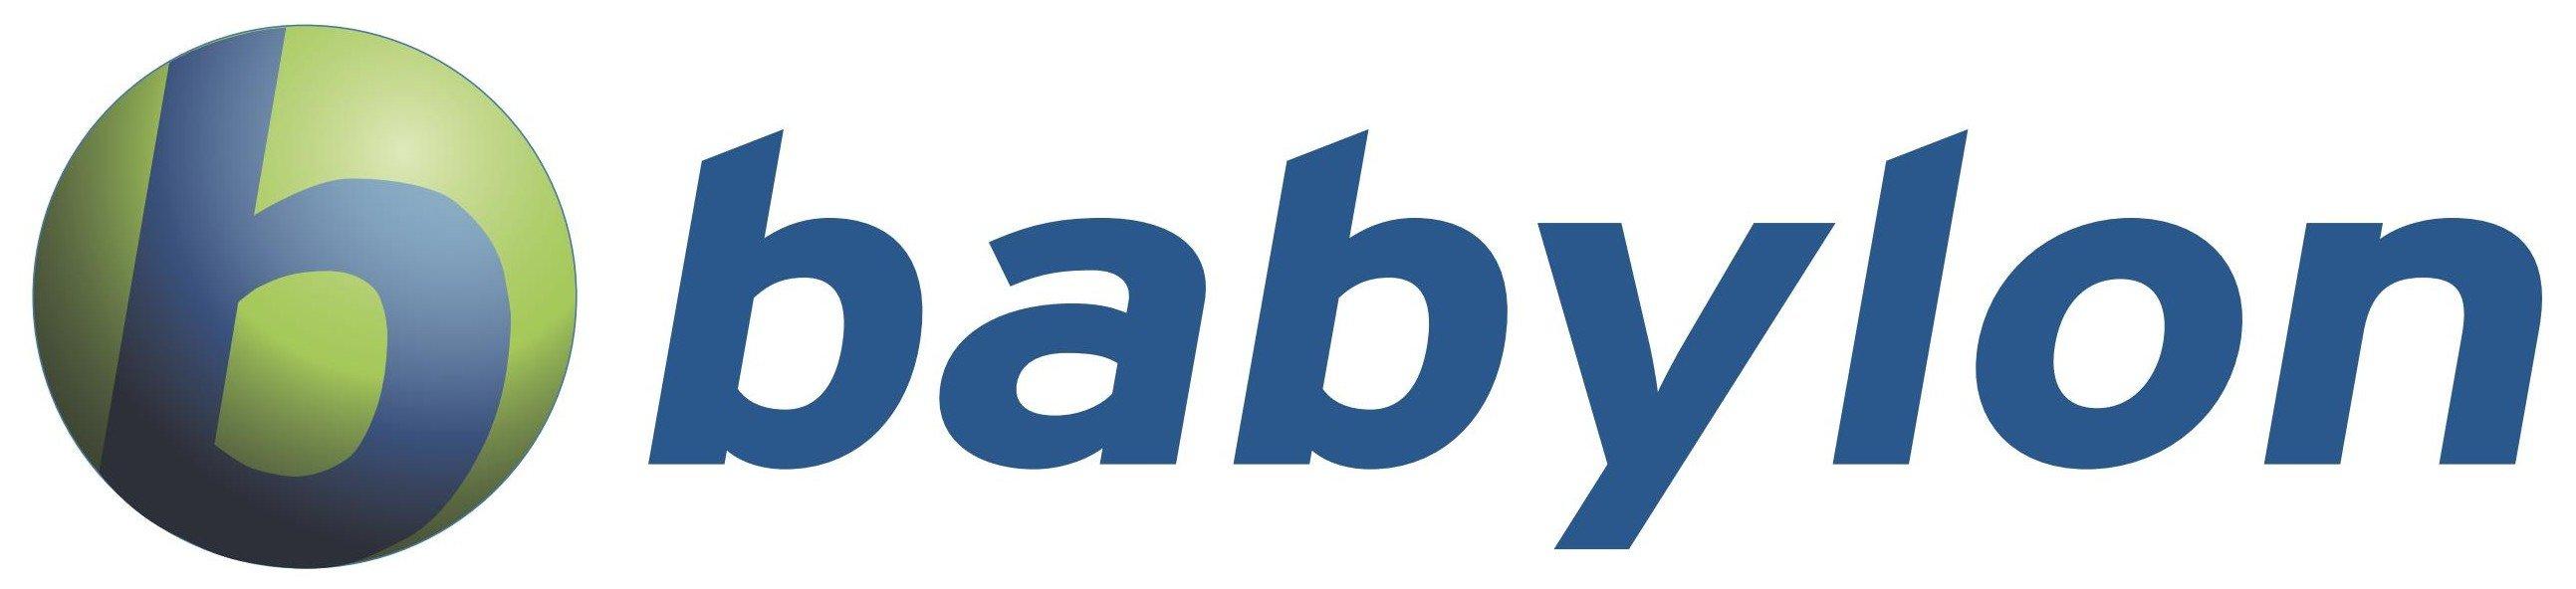 Babylon Logo [EPS File] Vector EPS Free Download, Logo, Icons, Brand Emblems